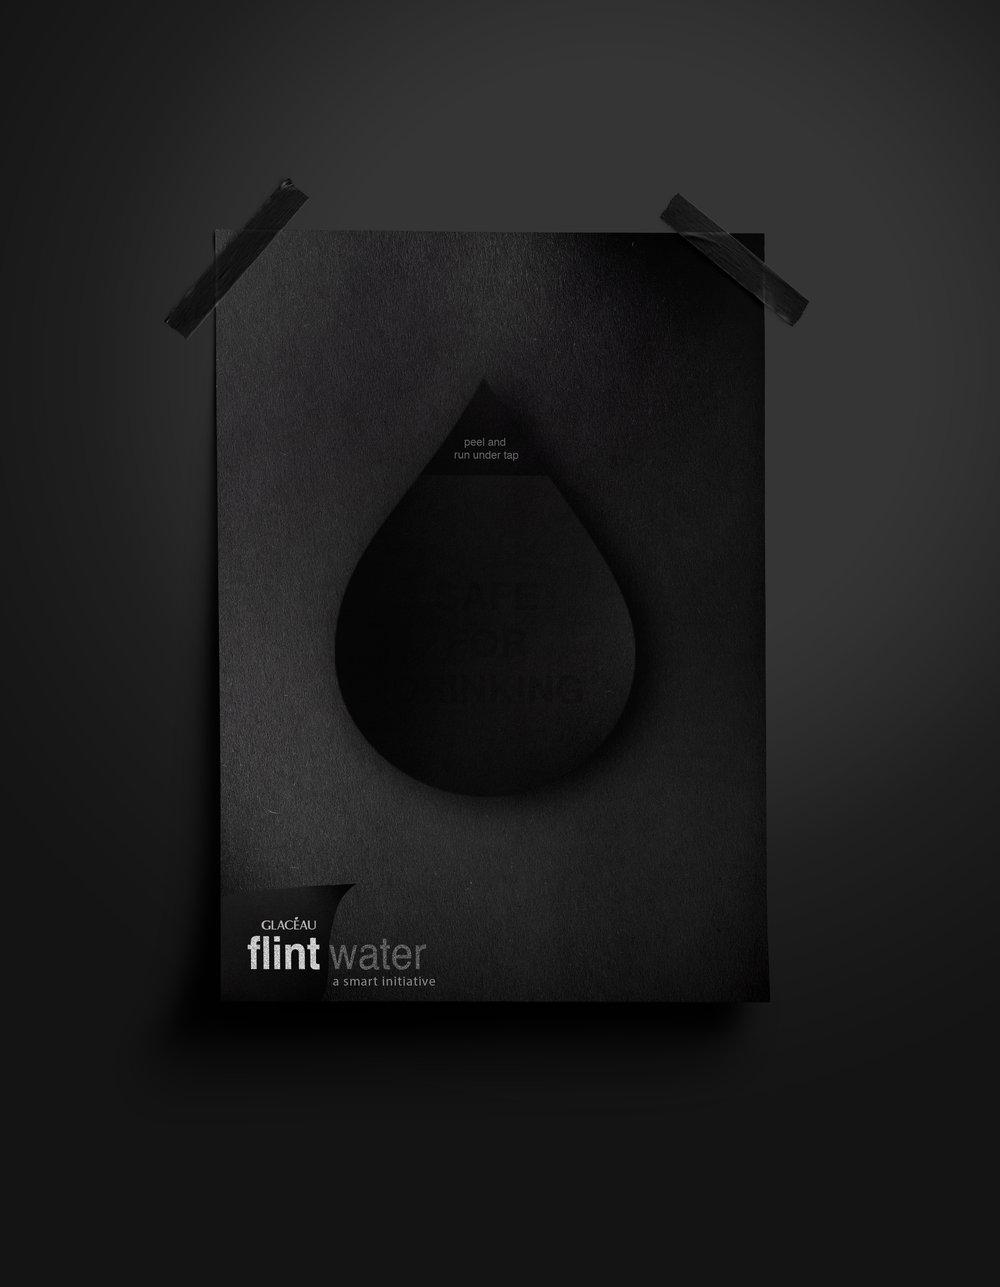 A3-Poster-Mockup-vol-12.jpg